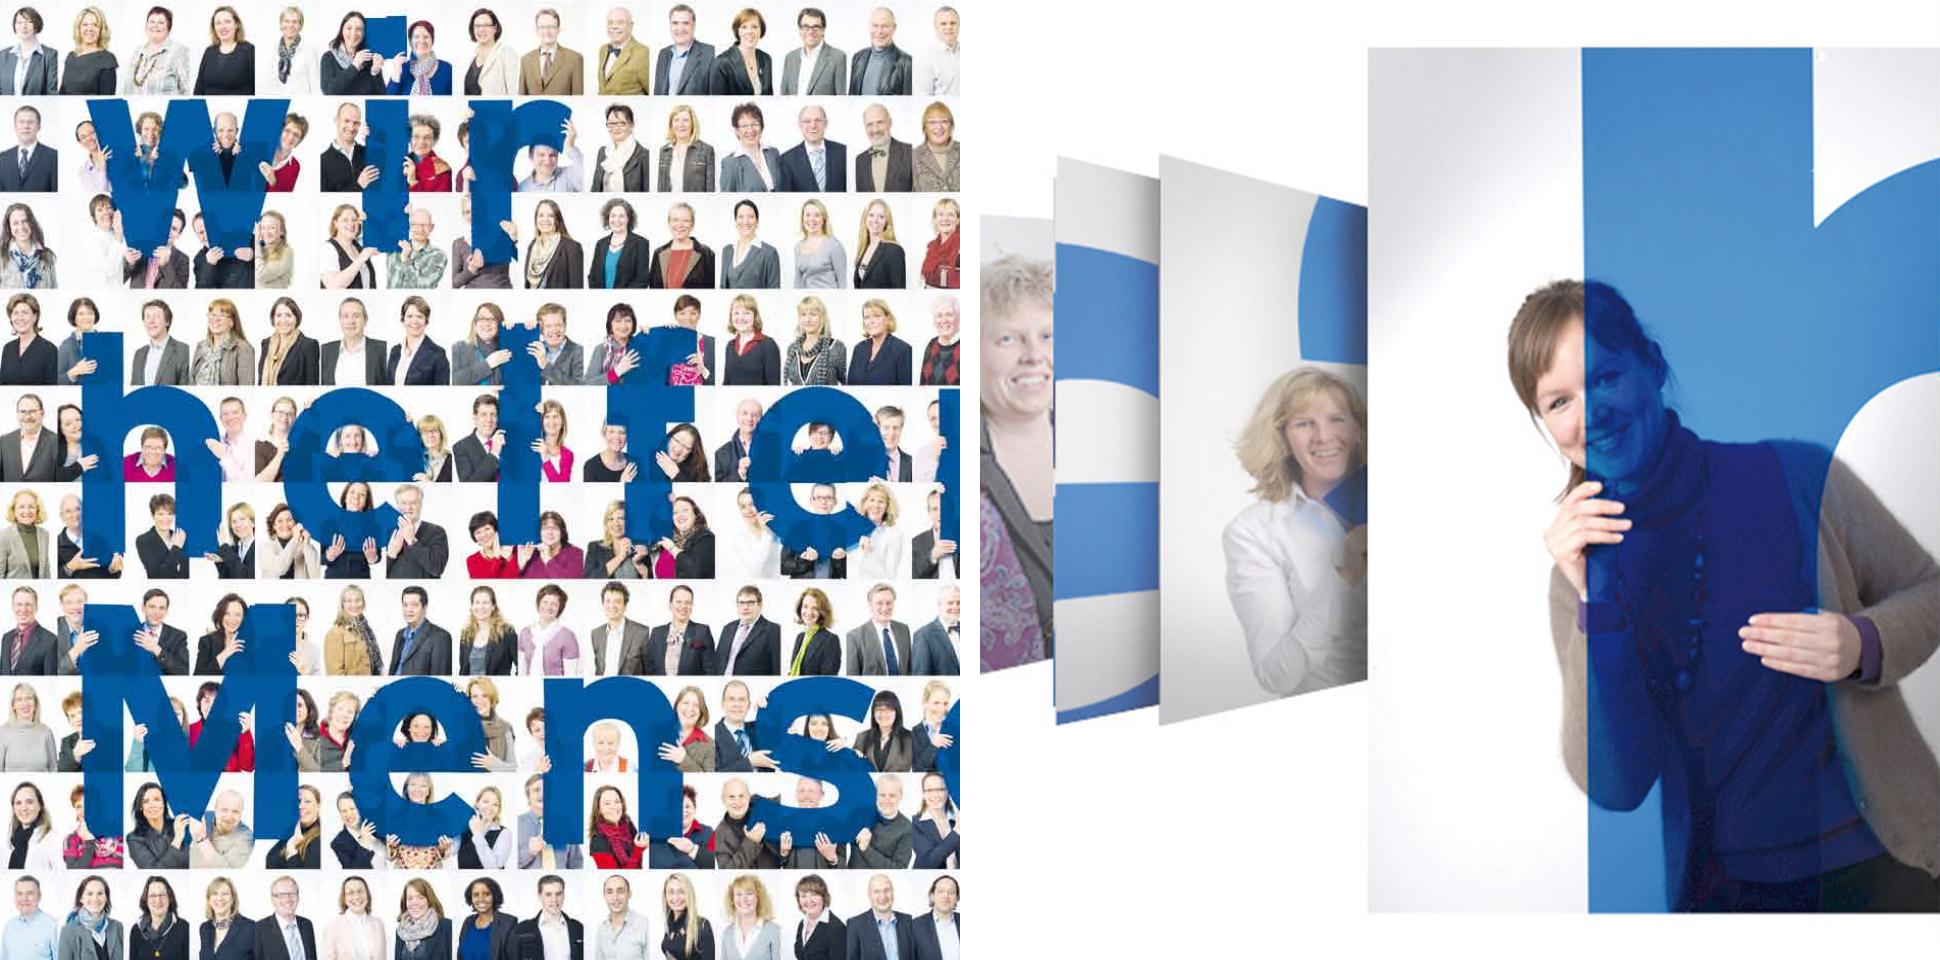 fresenius-kabi corporate-identity kampagne polarwerk